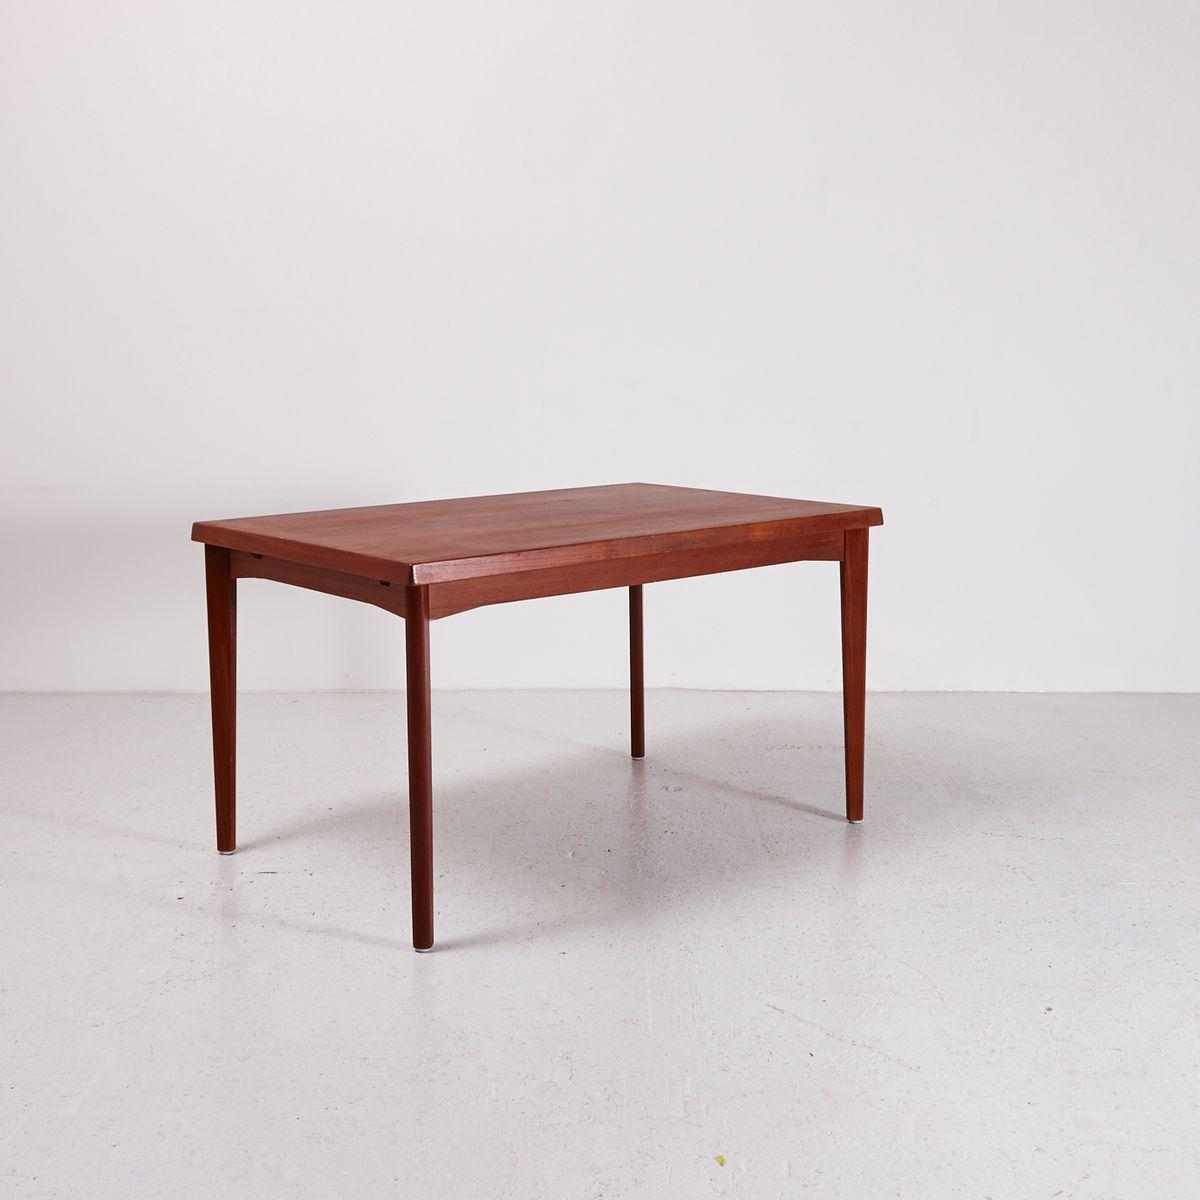 Extendable Teak Dining Table by Henning Kj230rnulf for Vejle  : extendable teak dining table by henning kjaernulf for vejle mobelfabrik 1960s 2 from www.pamono.co.uk size 1200 x 1200 jpeg 52kB